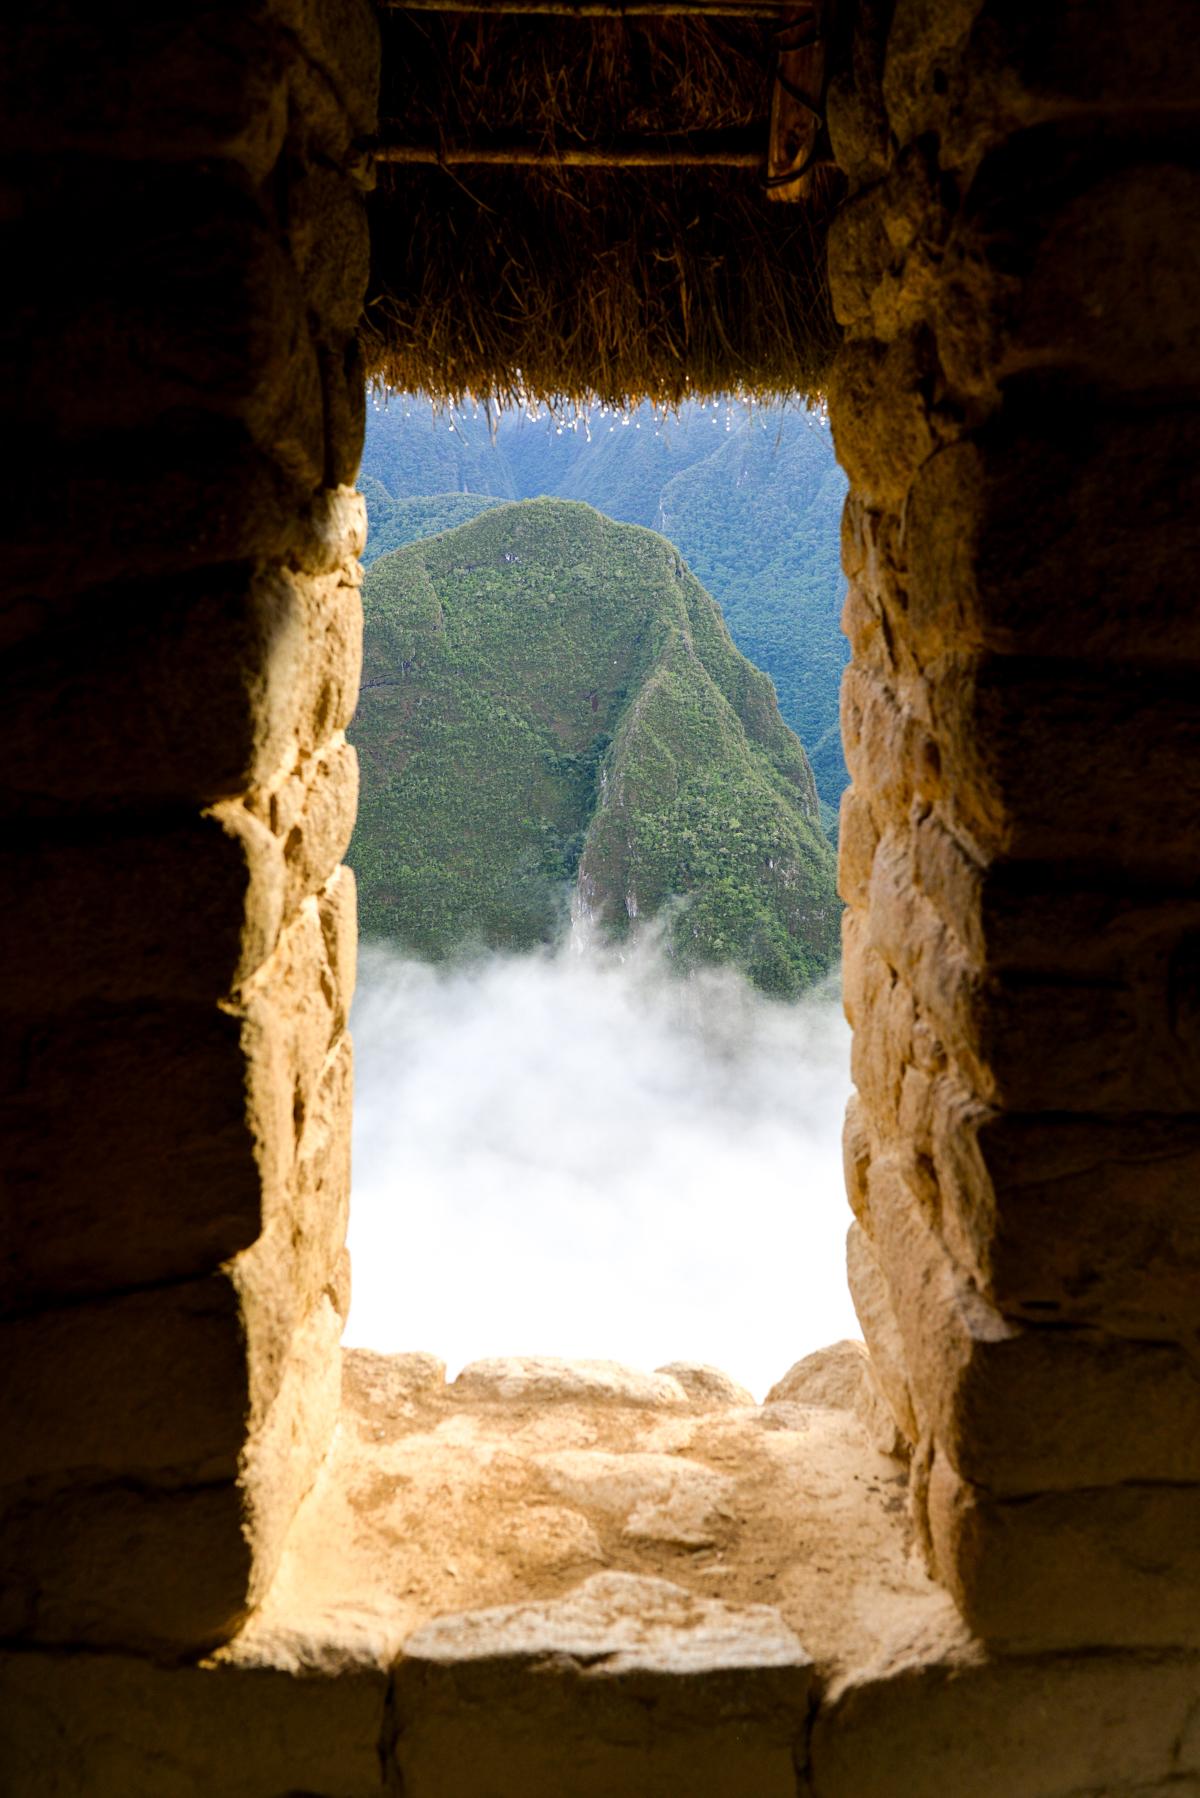 Stacie Flinner x Belmond Machu Picchu Peru-15